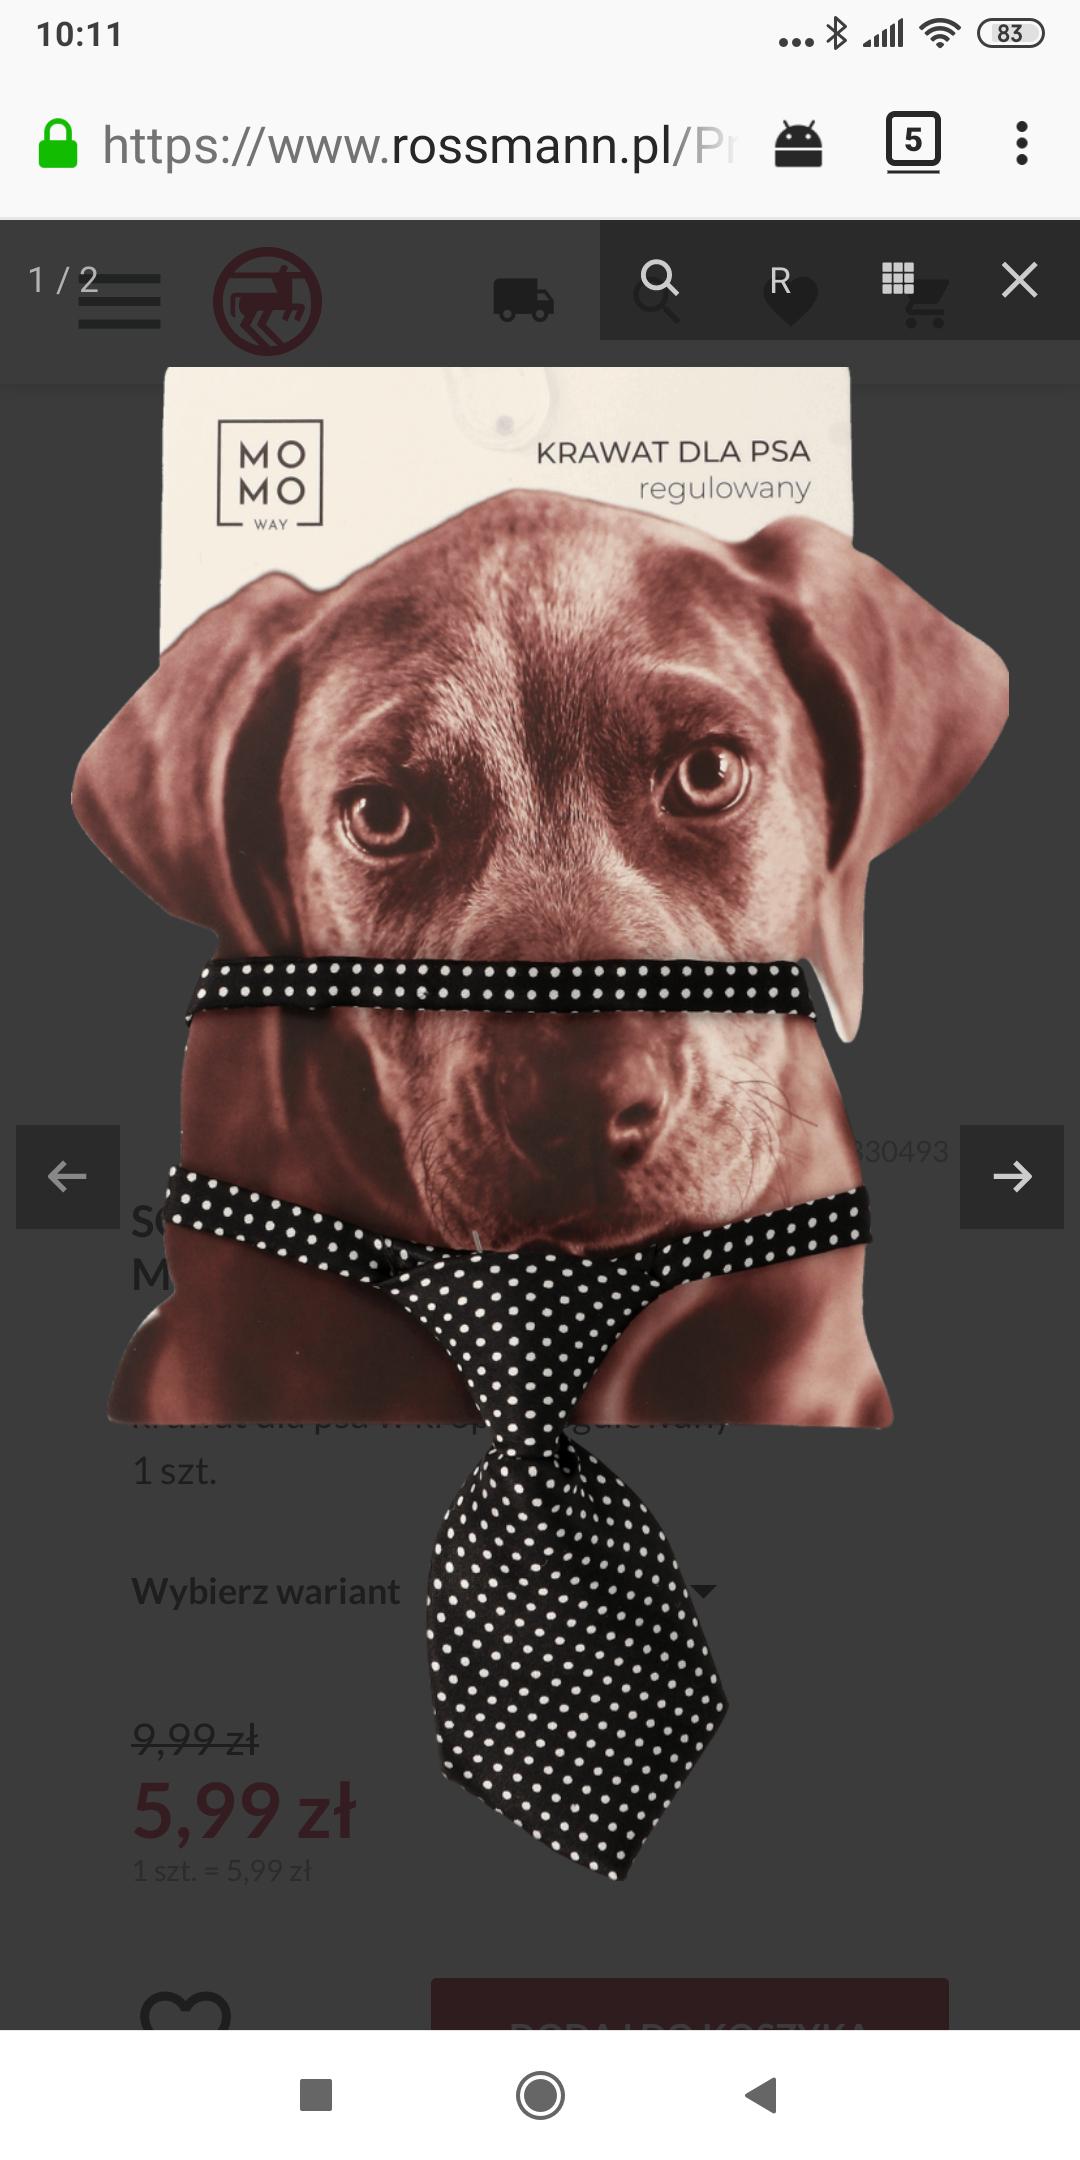 krawat dla psa w kropki, regulowany